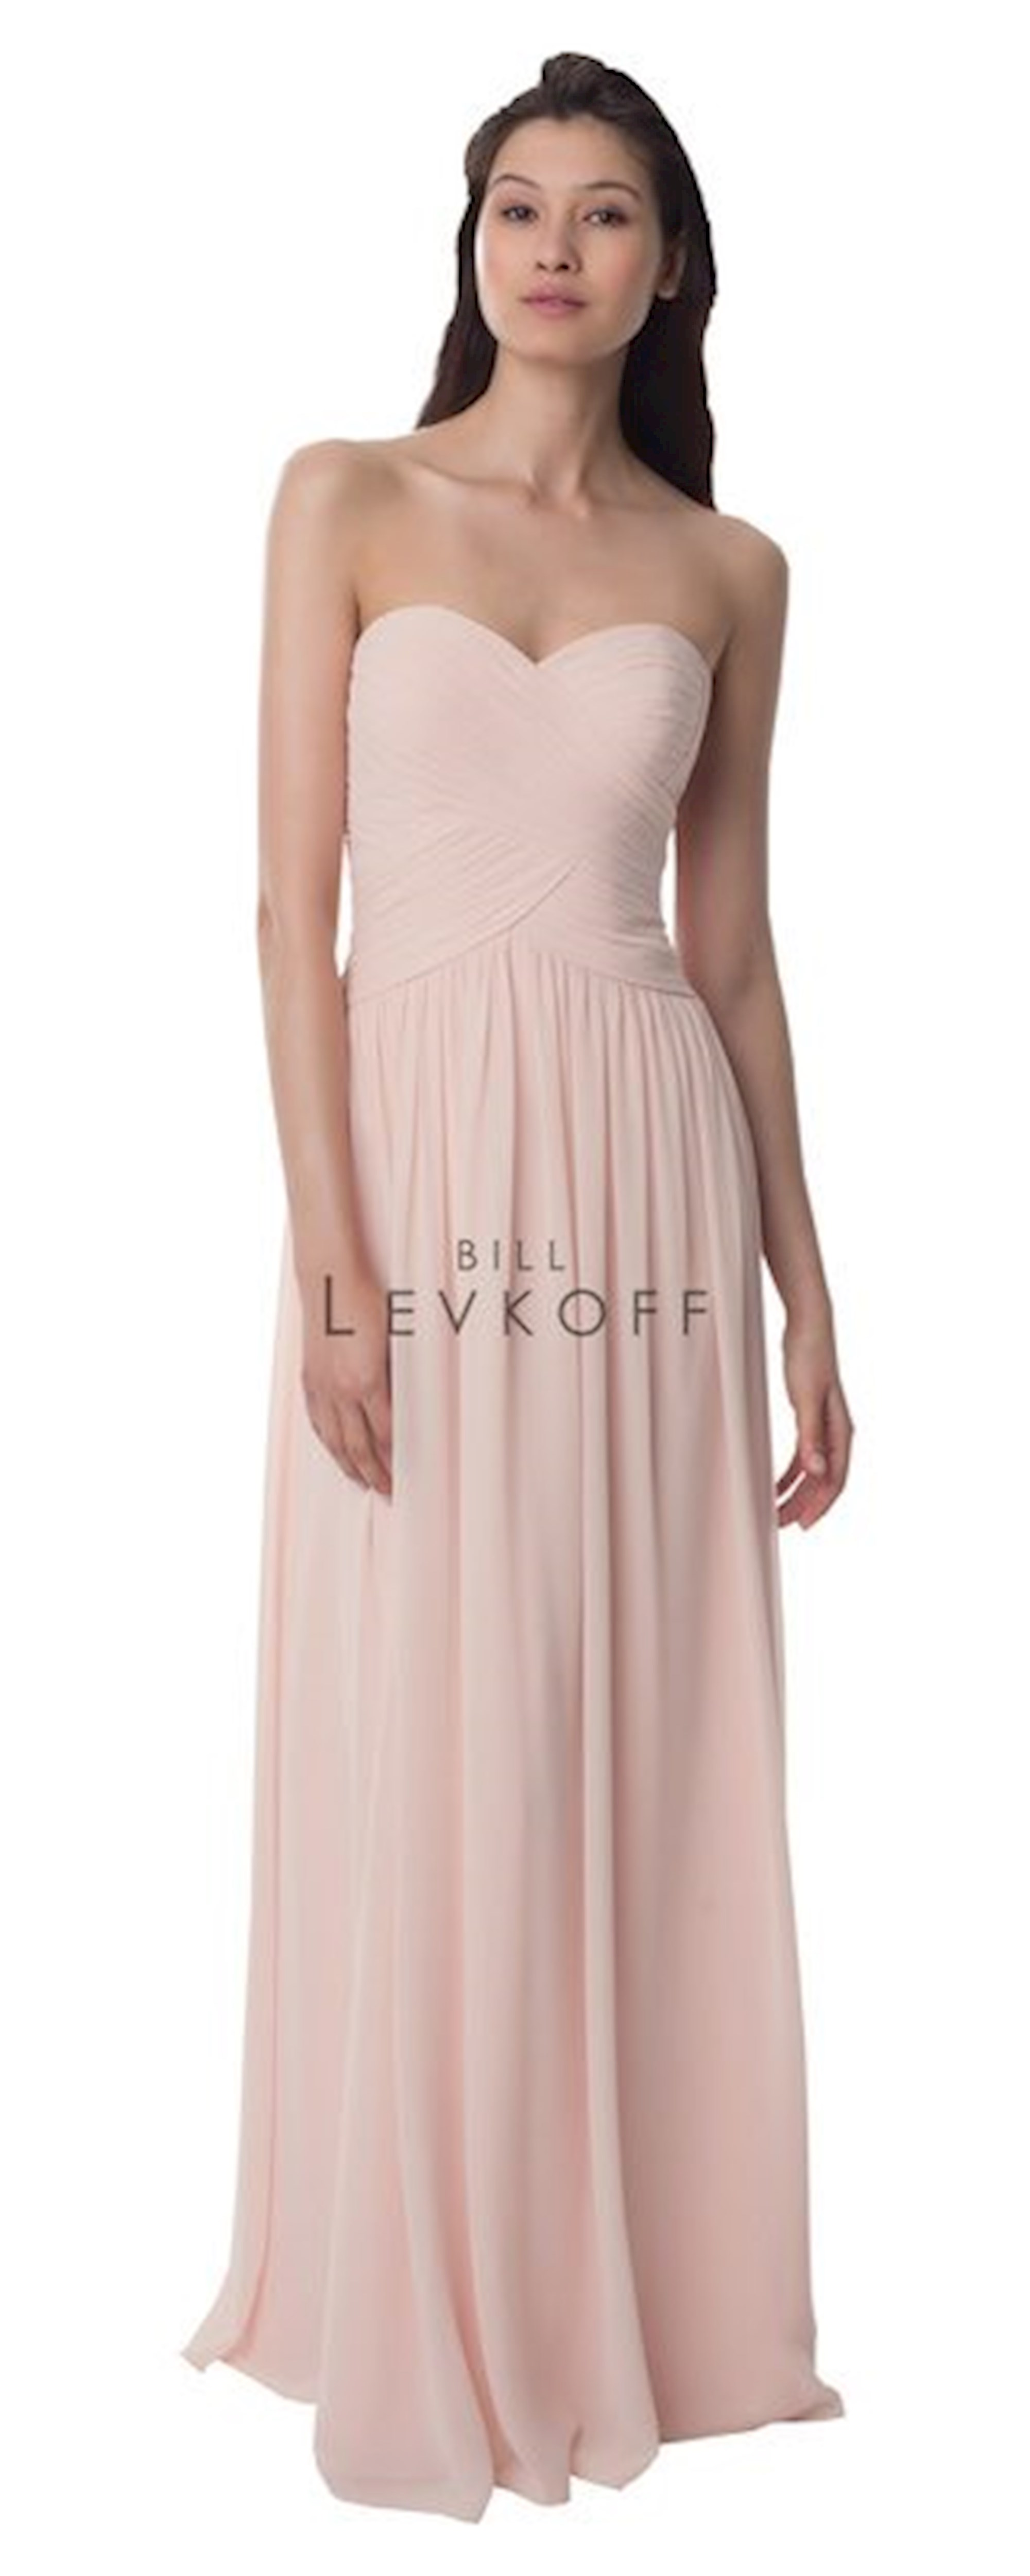 6ab2cee2e944 Bill Levkoff Bridesmaids Dresses   Regiss in Kentucky - 982